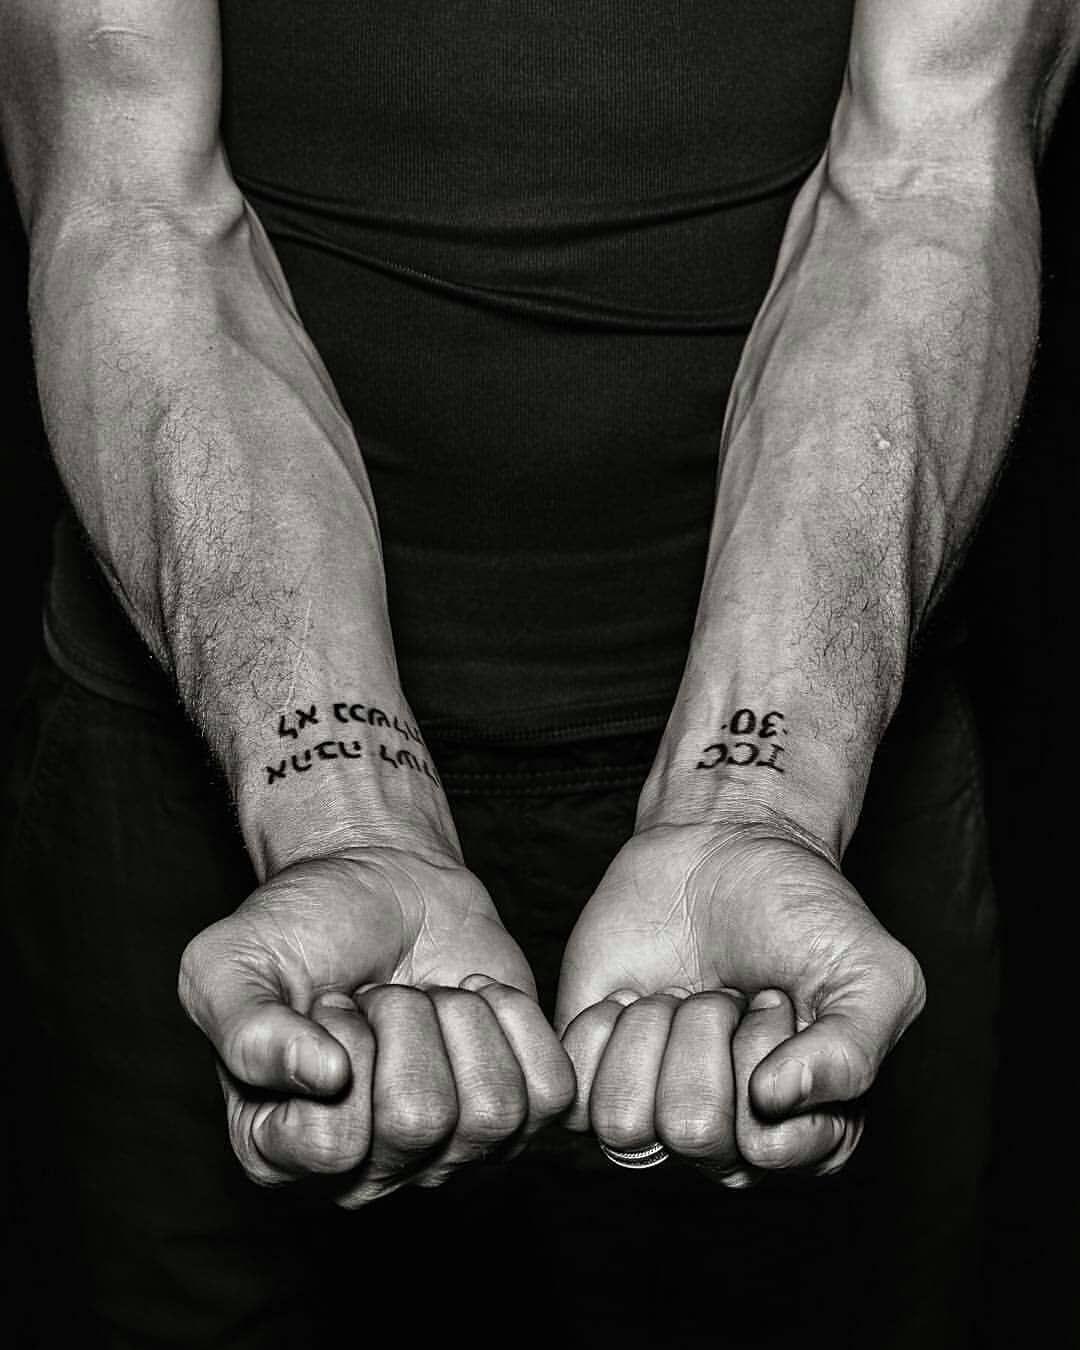 Drake Steph Curry Tattoo : drake, steph, curry, tattoo, Steph, Curry, Tattoo, Meaning, Gallery, Collection